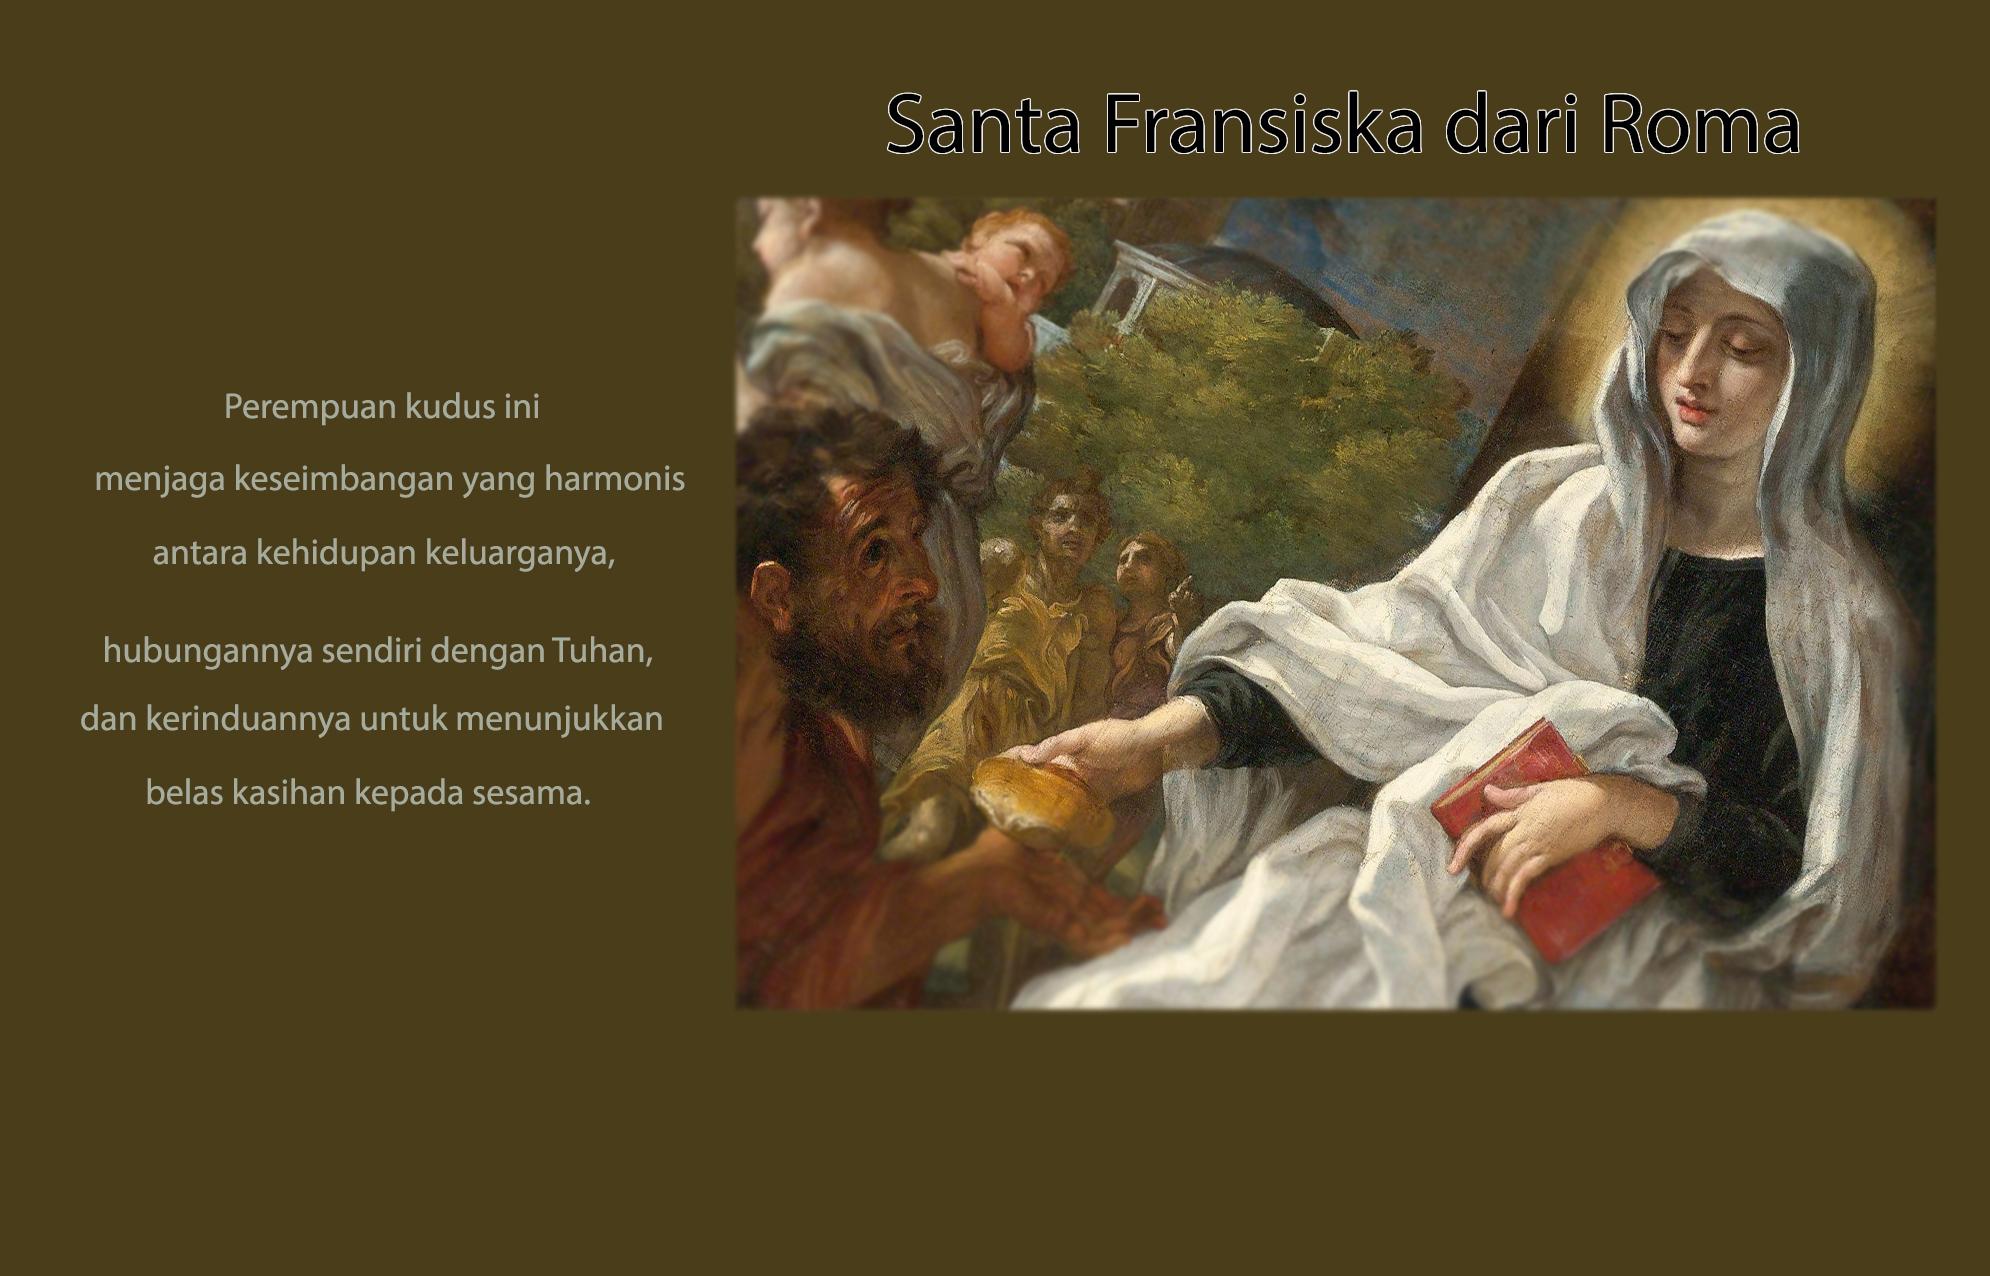 09 Maret, Santa Fransiska dari Roma, Santo Filemon, Santa Perpetua dan Santa Felisitas, katekese, katolik, Komsos KWI, Konferensi Waligereja Indonesia, KWI, Para Kudus di Surga, putera allah, santo santa, Sukacita, teladan kita